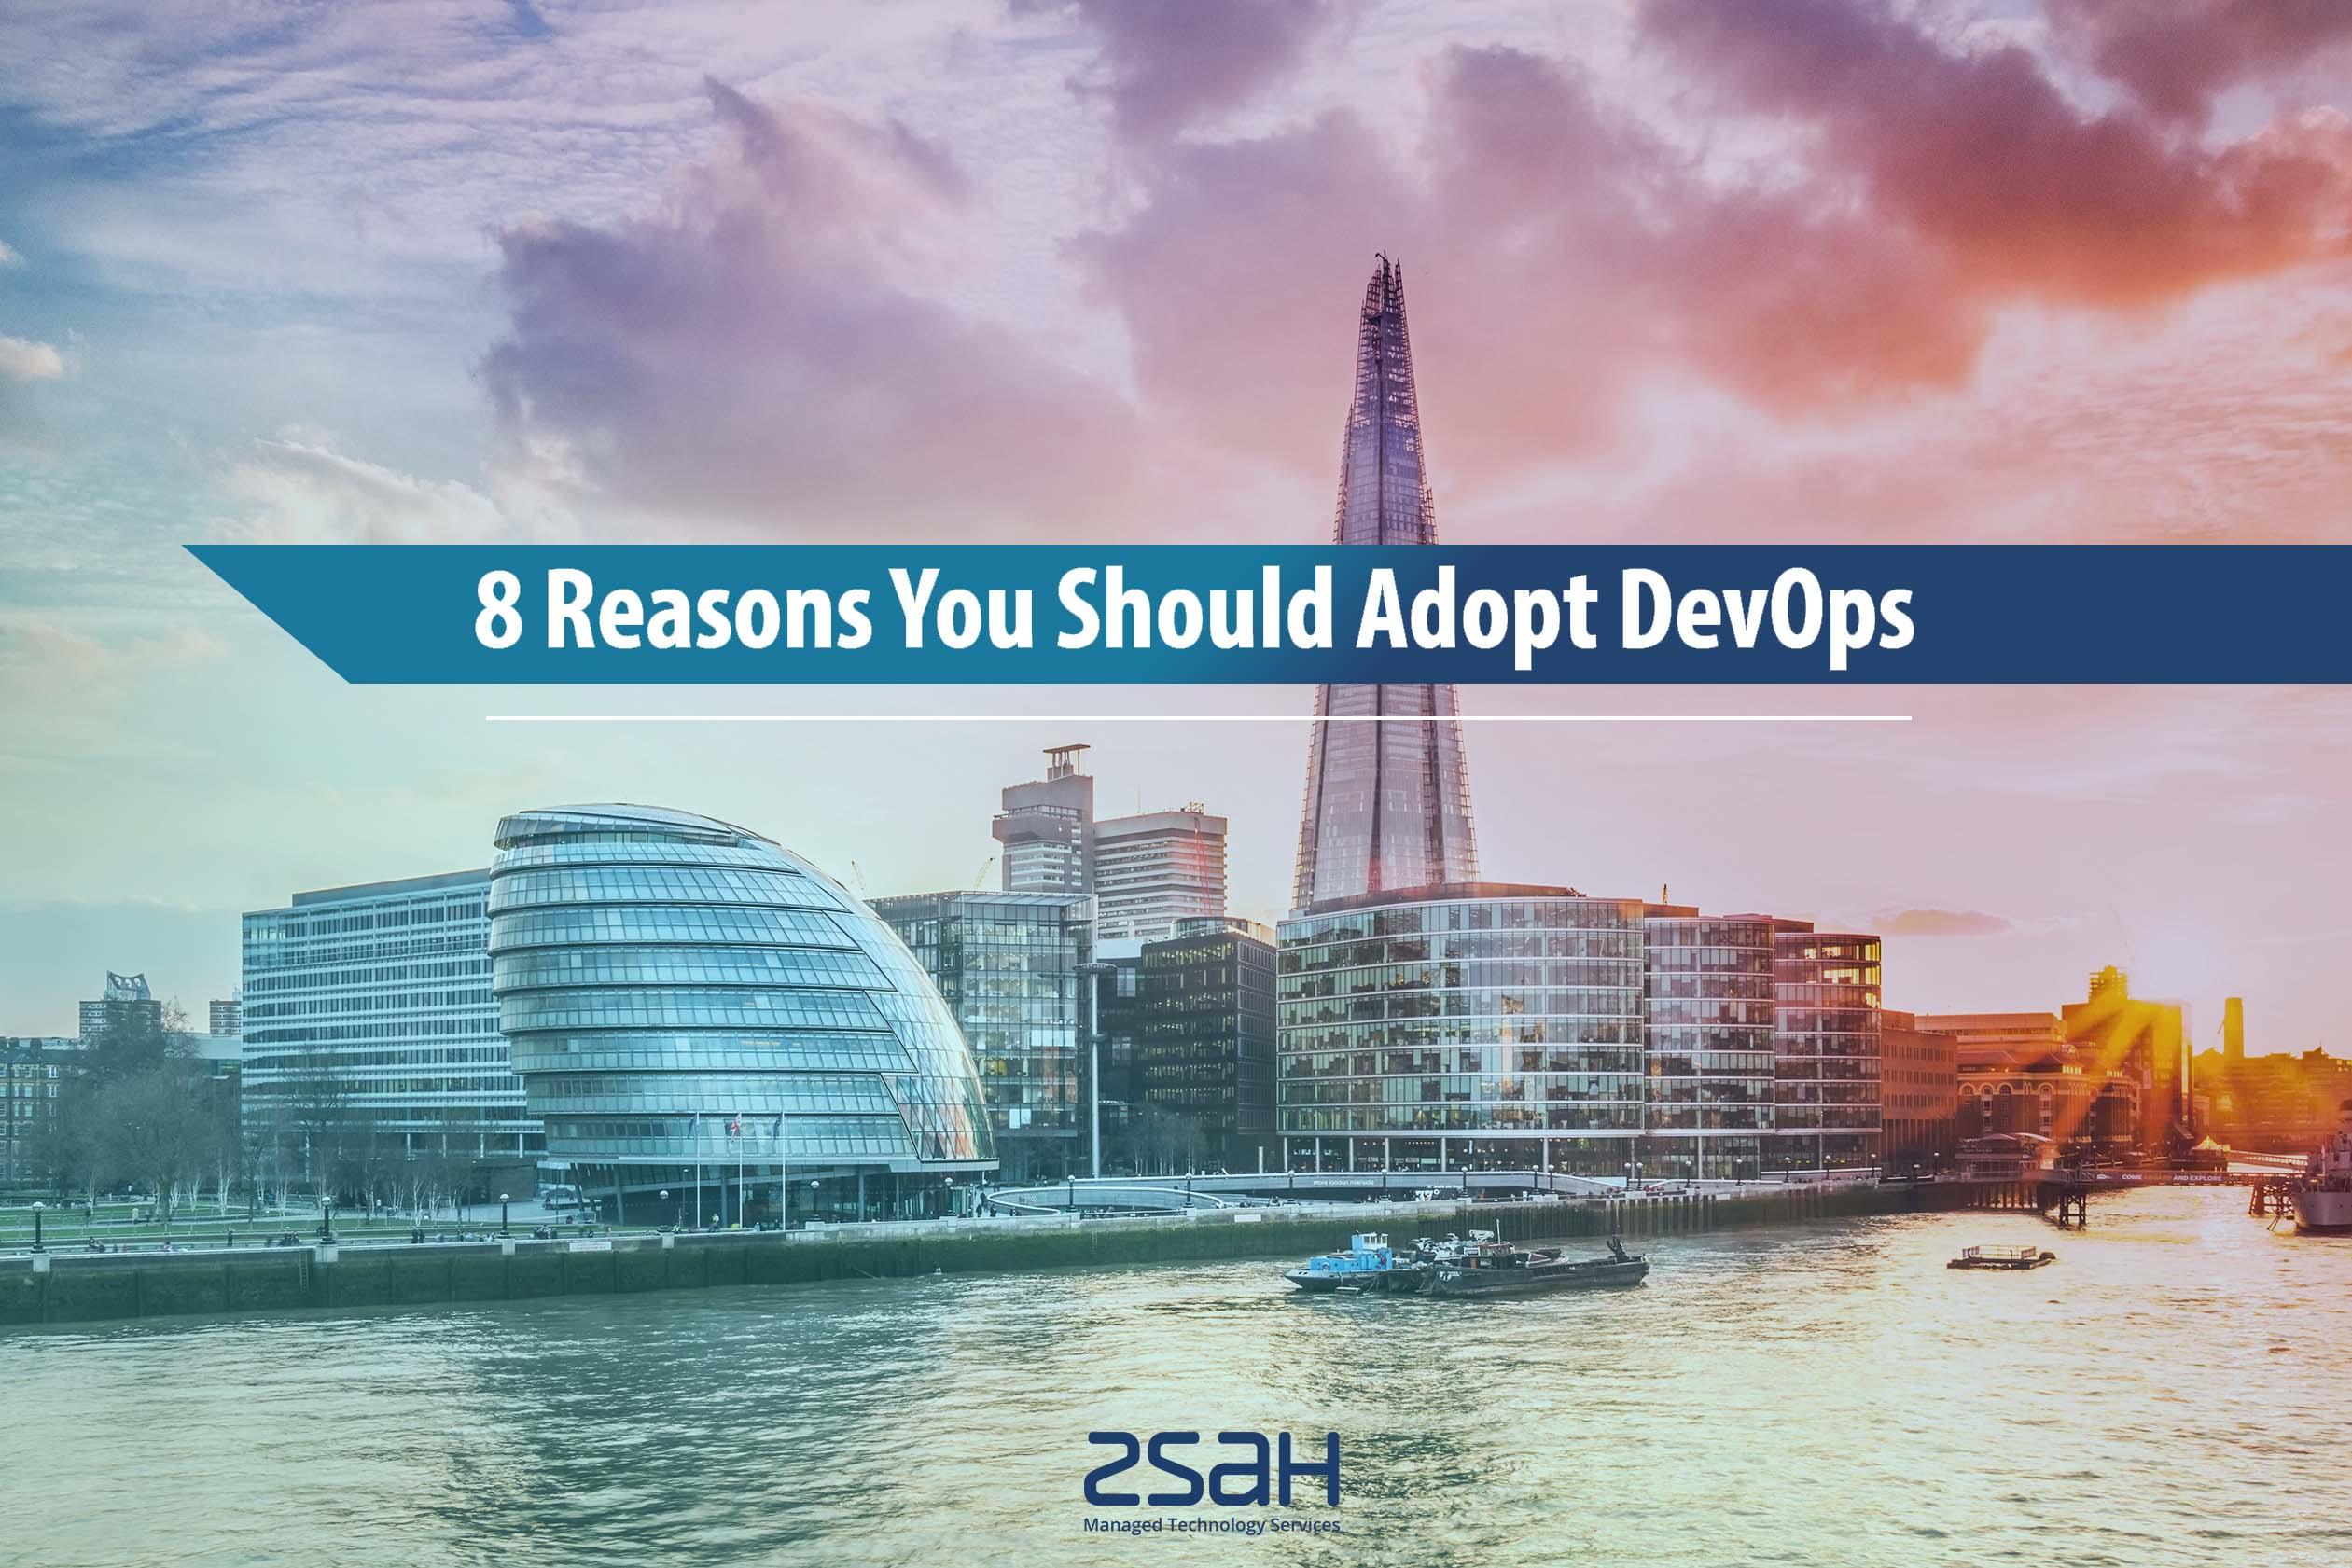 8 reasons you should adopt Devops image - zsah